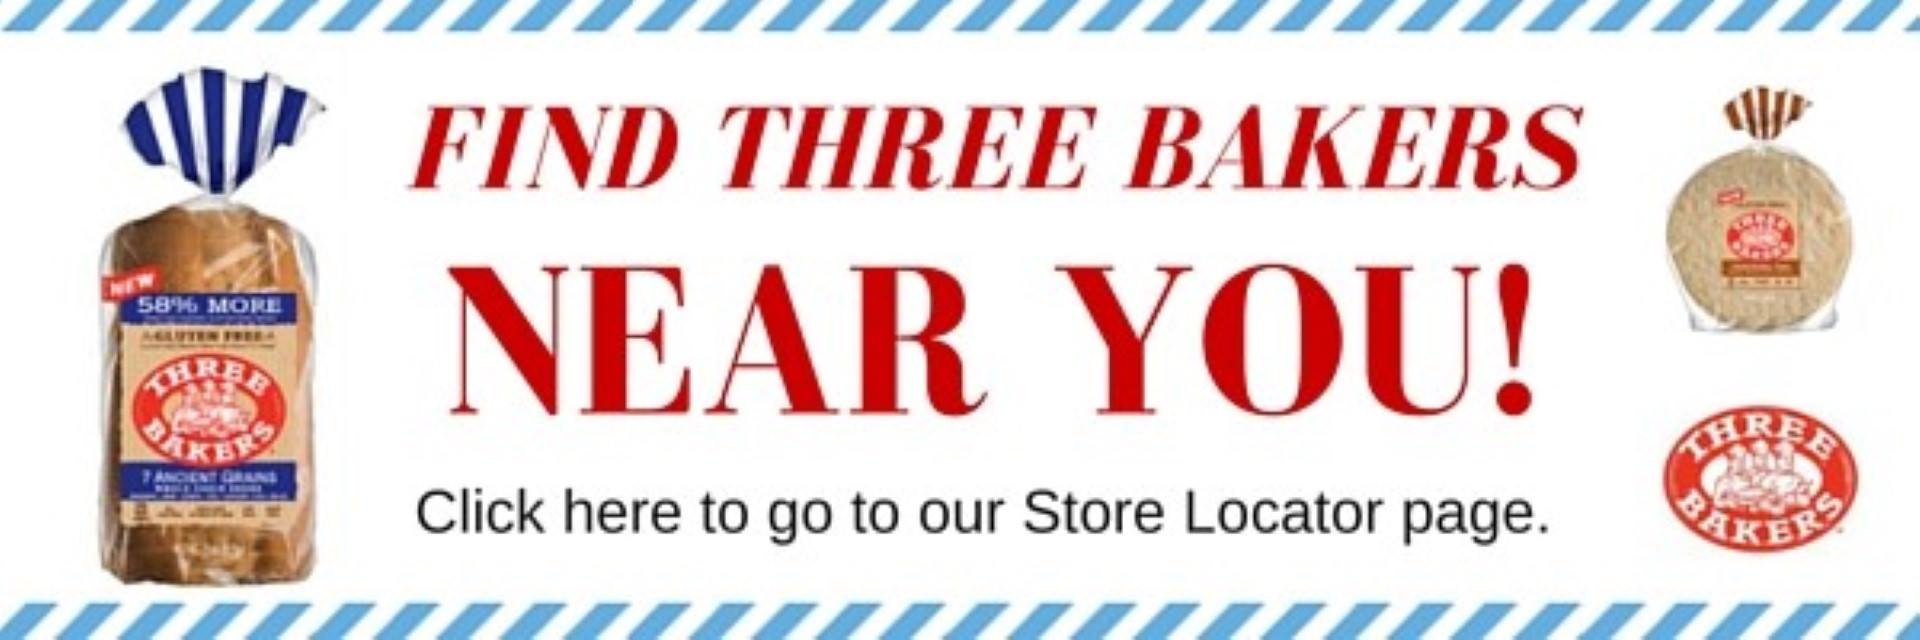 3B - Store Locator CTA